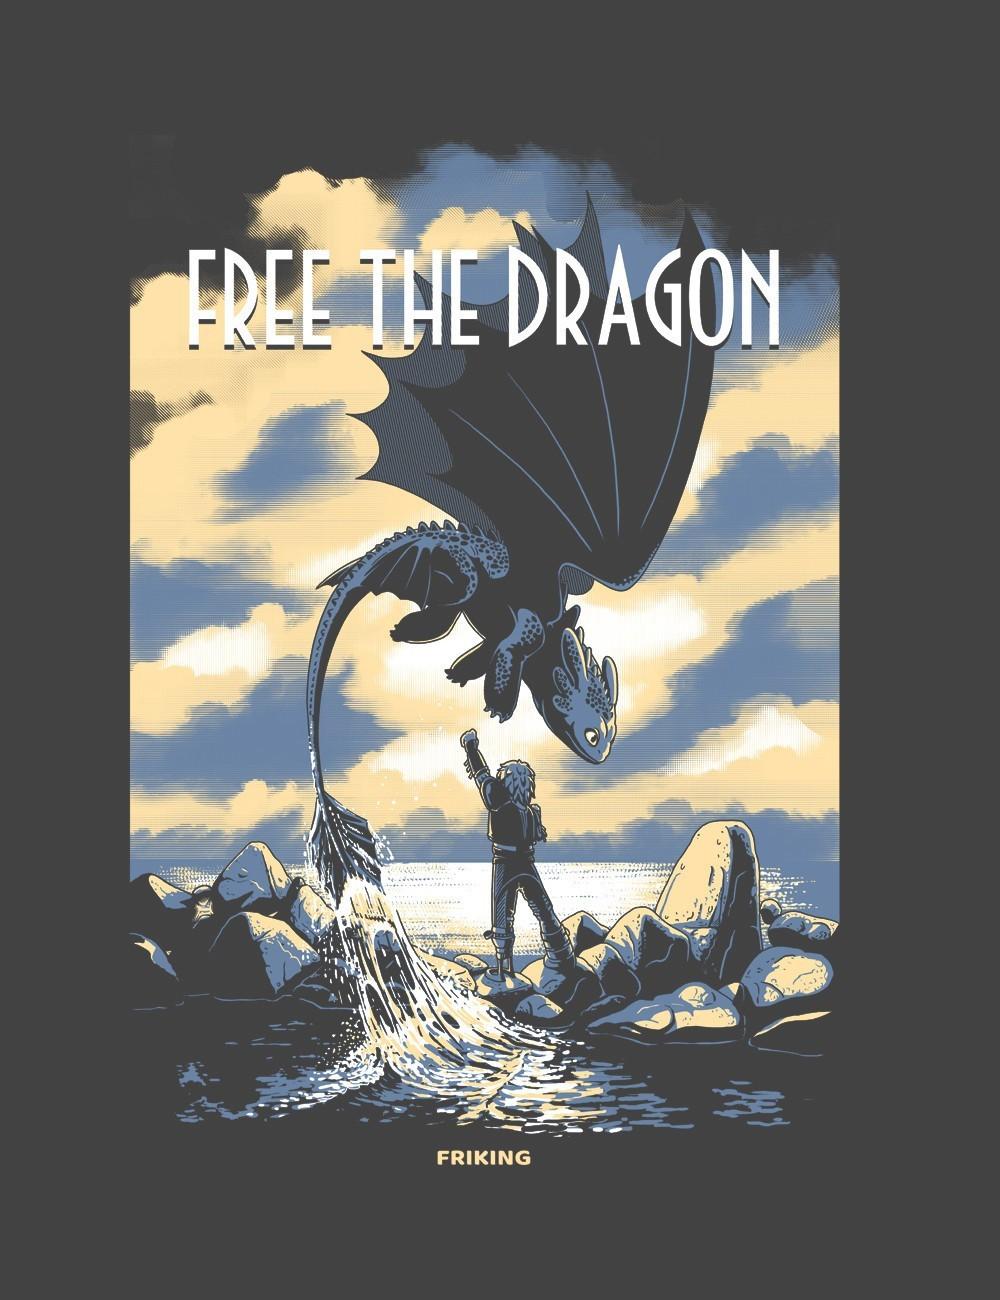 Free the dragon